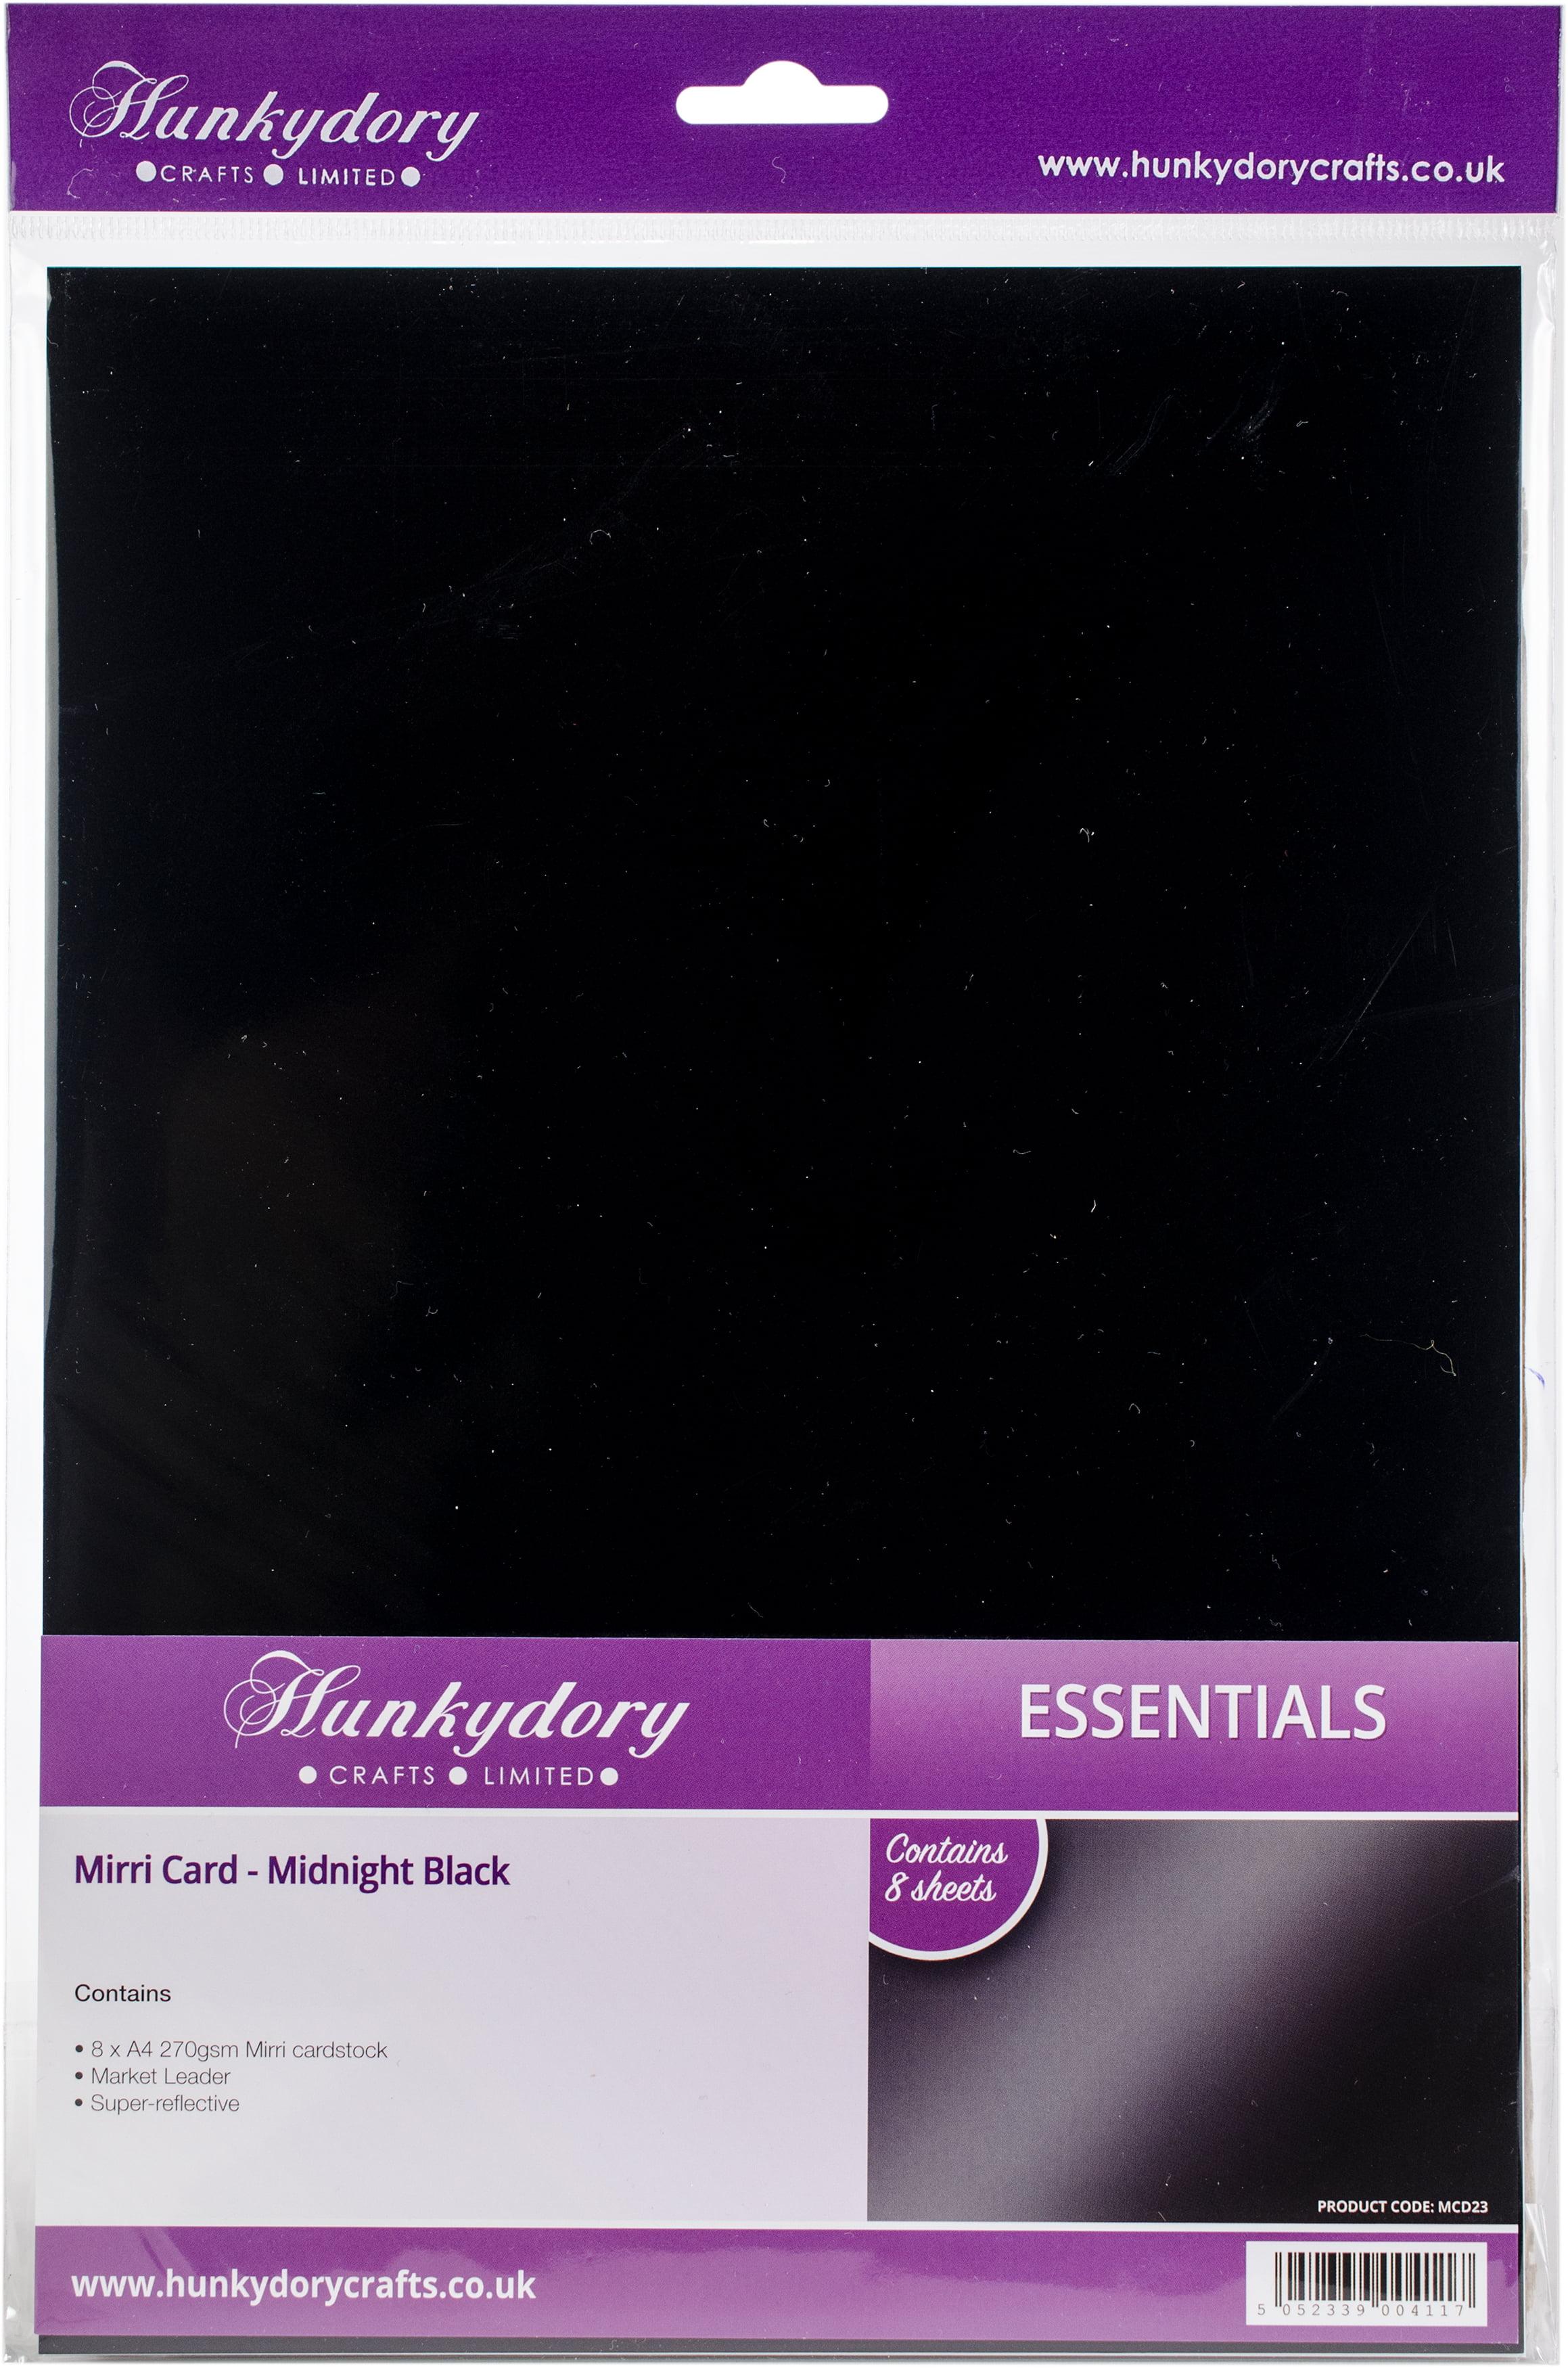 Hunkydory Mirri Super-Reflective A4 Cardstock 8//Pkg-Festive